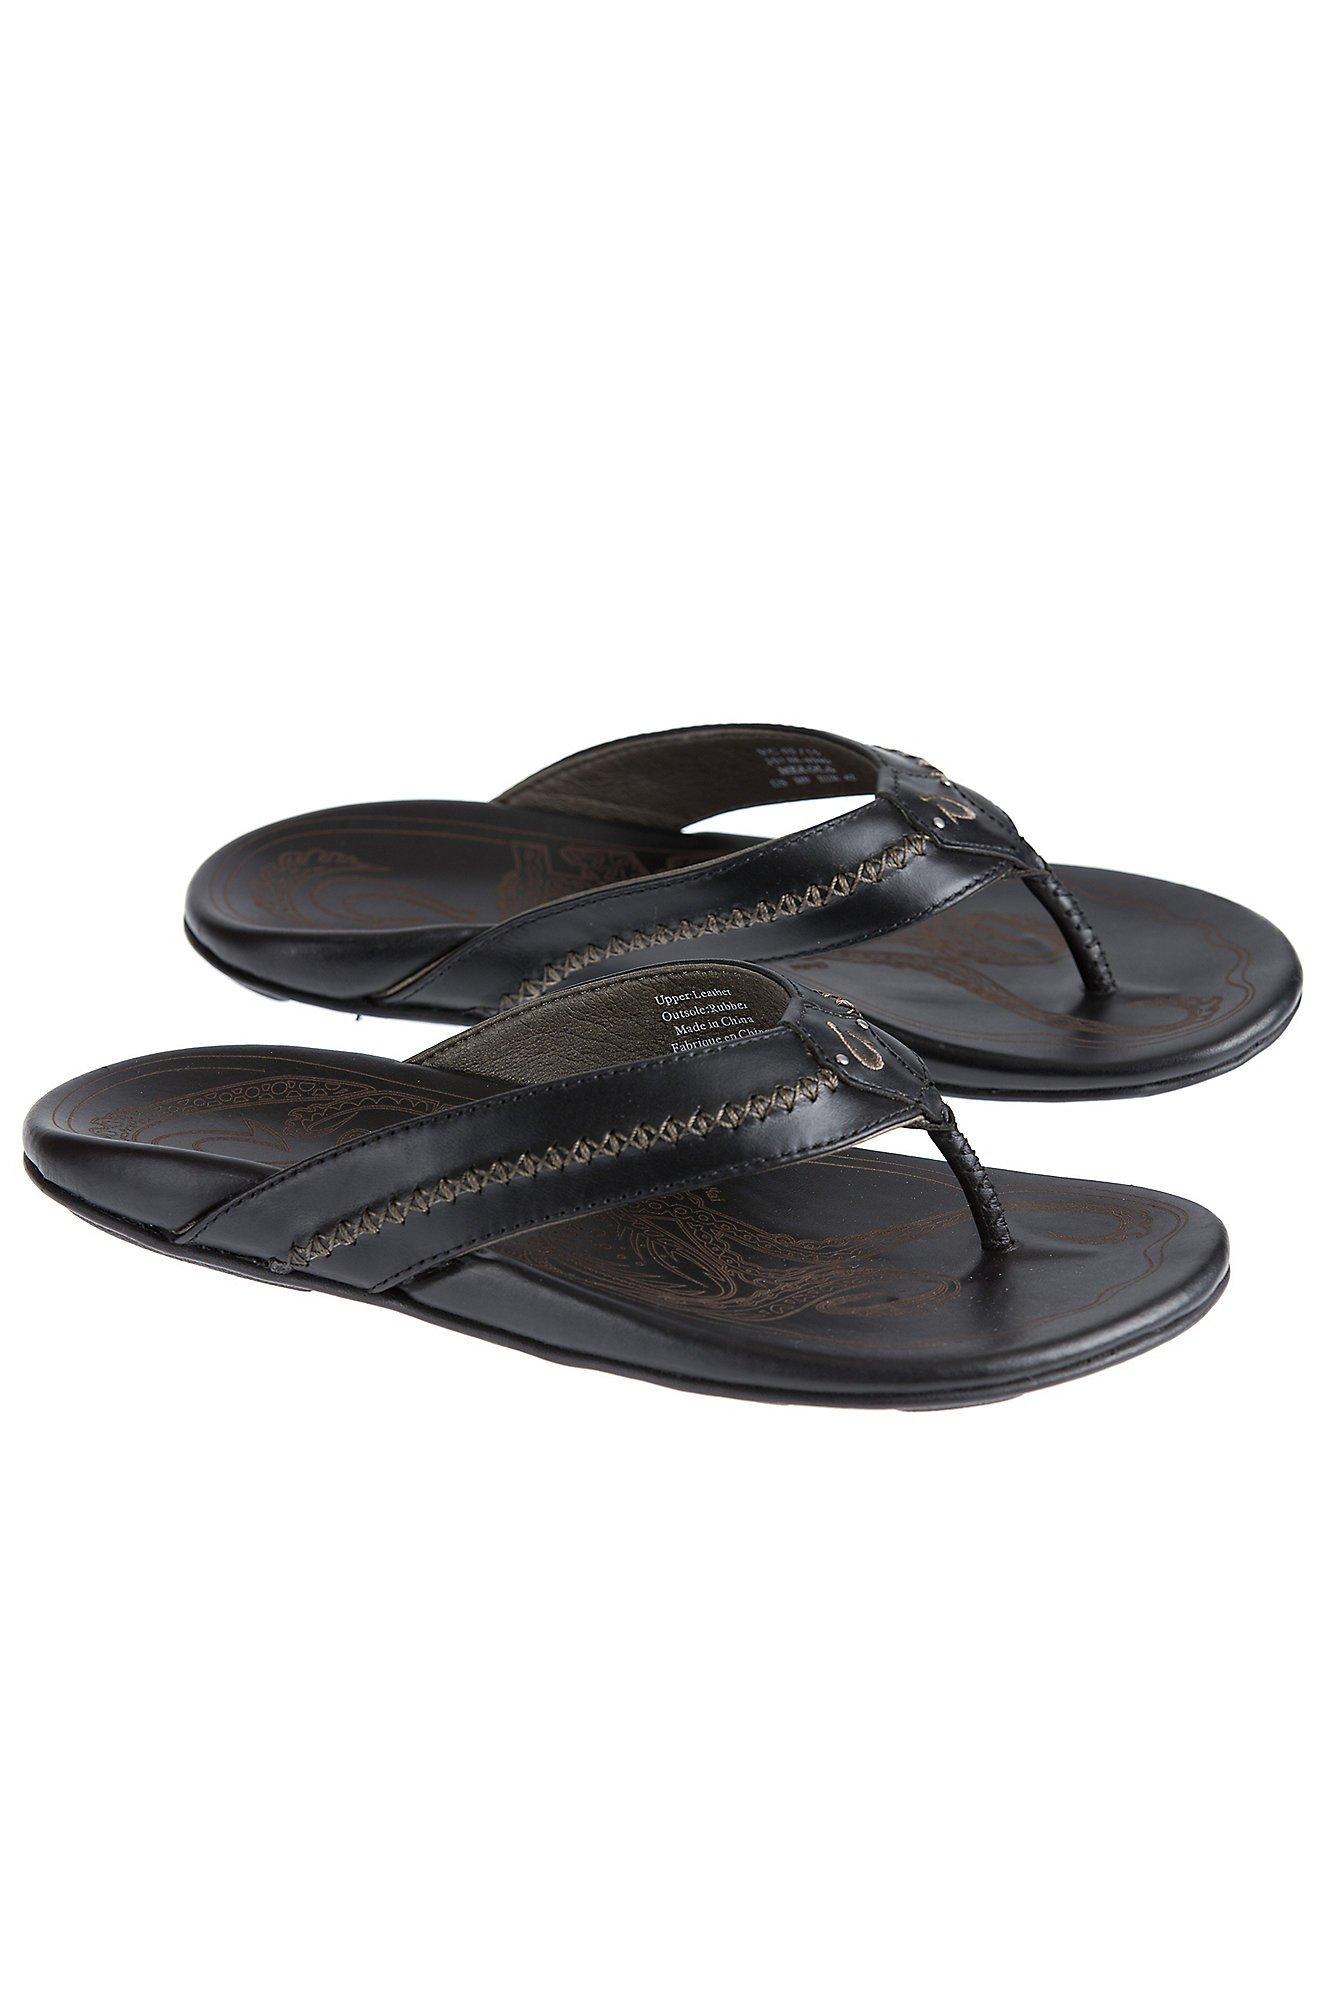 Men's OluKai Mea Ola Leather Sandals, BLACK/BLACK, Size 14